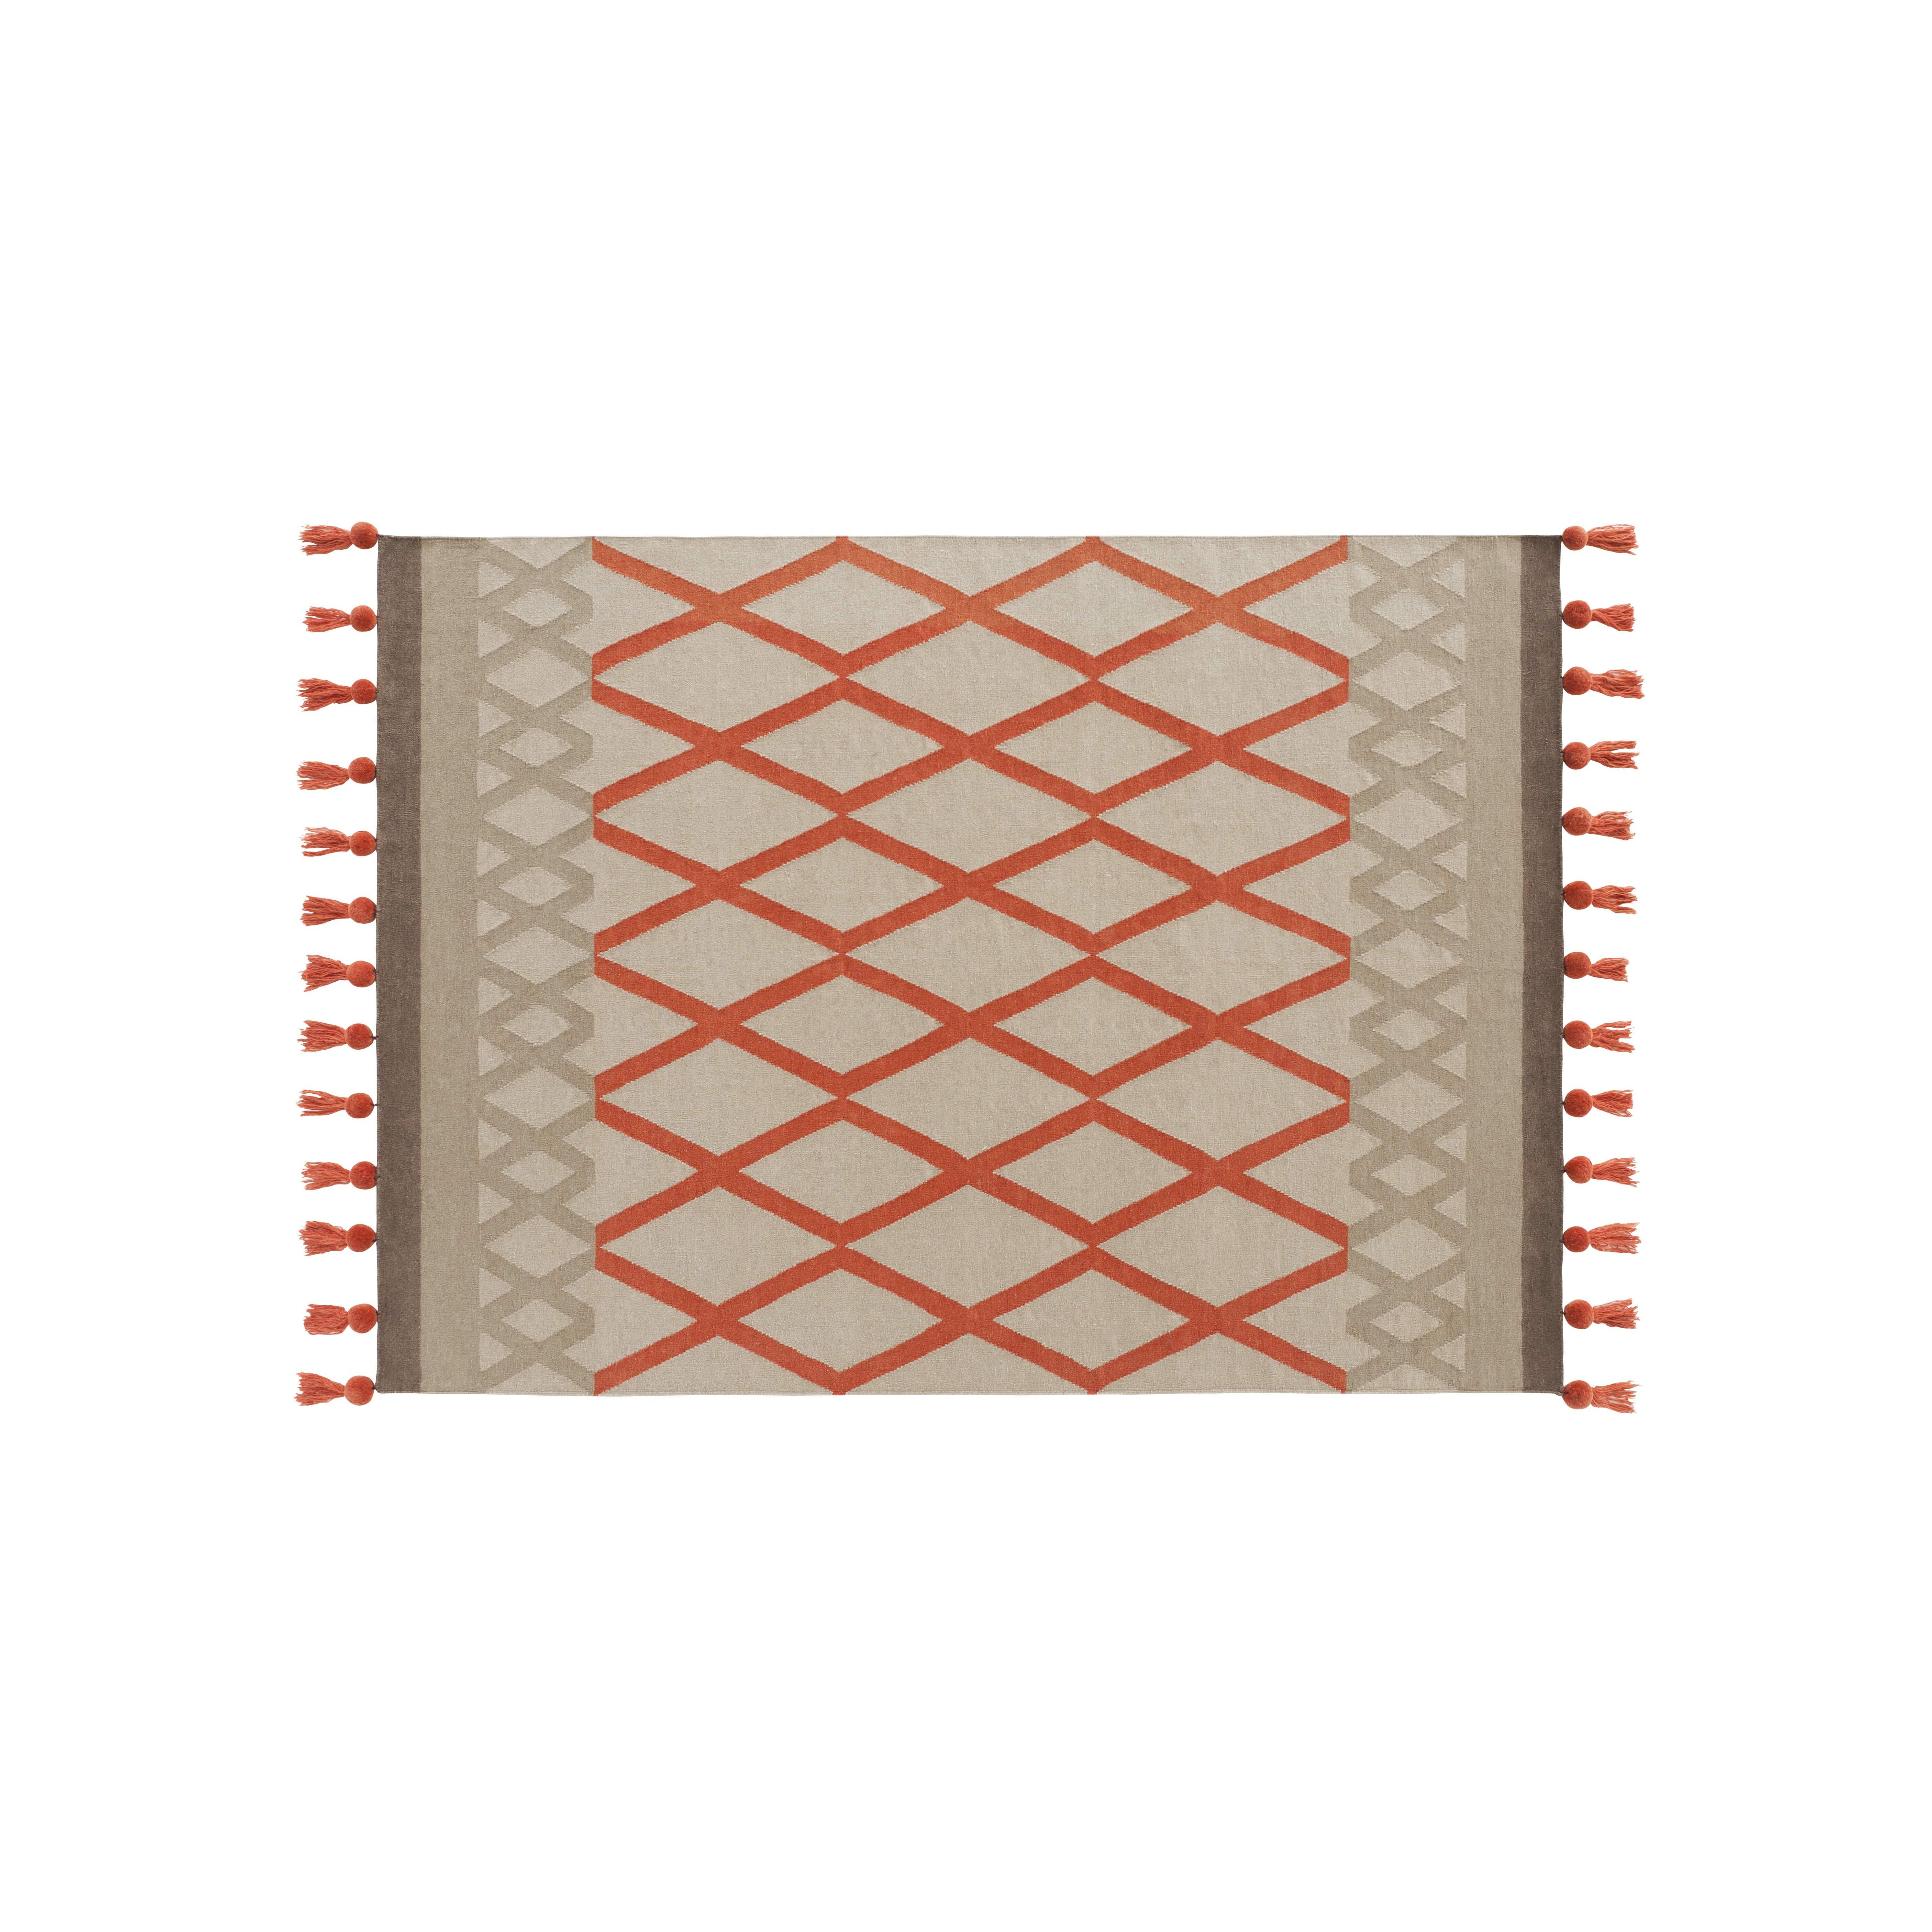 gan rugs kilim sioux area rug wayfair. Black Bedroom Furniture Sets. Home Design Ideas